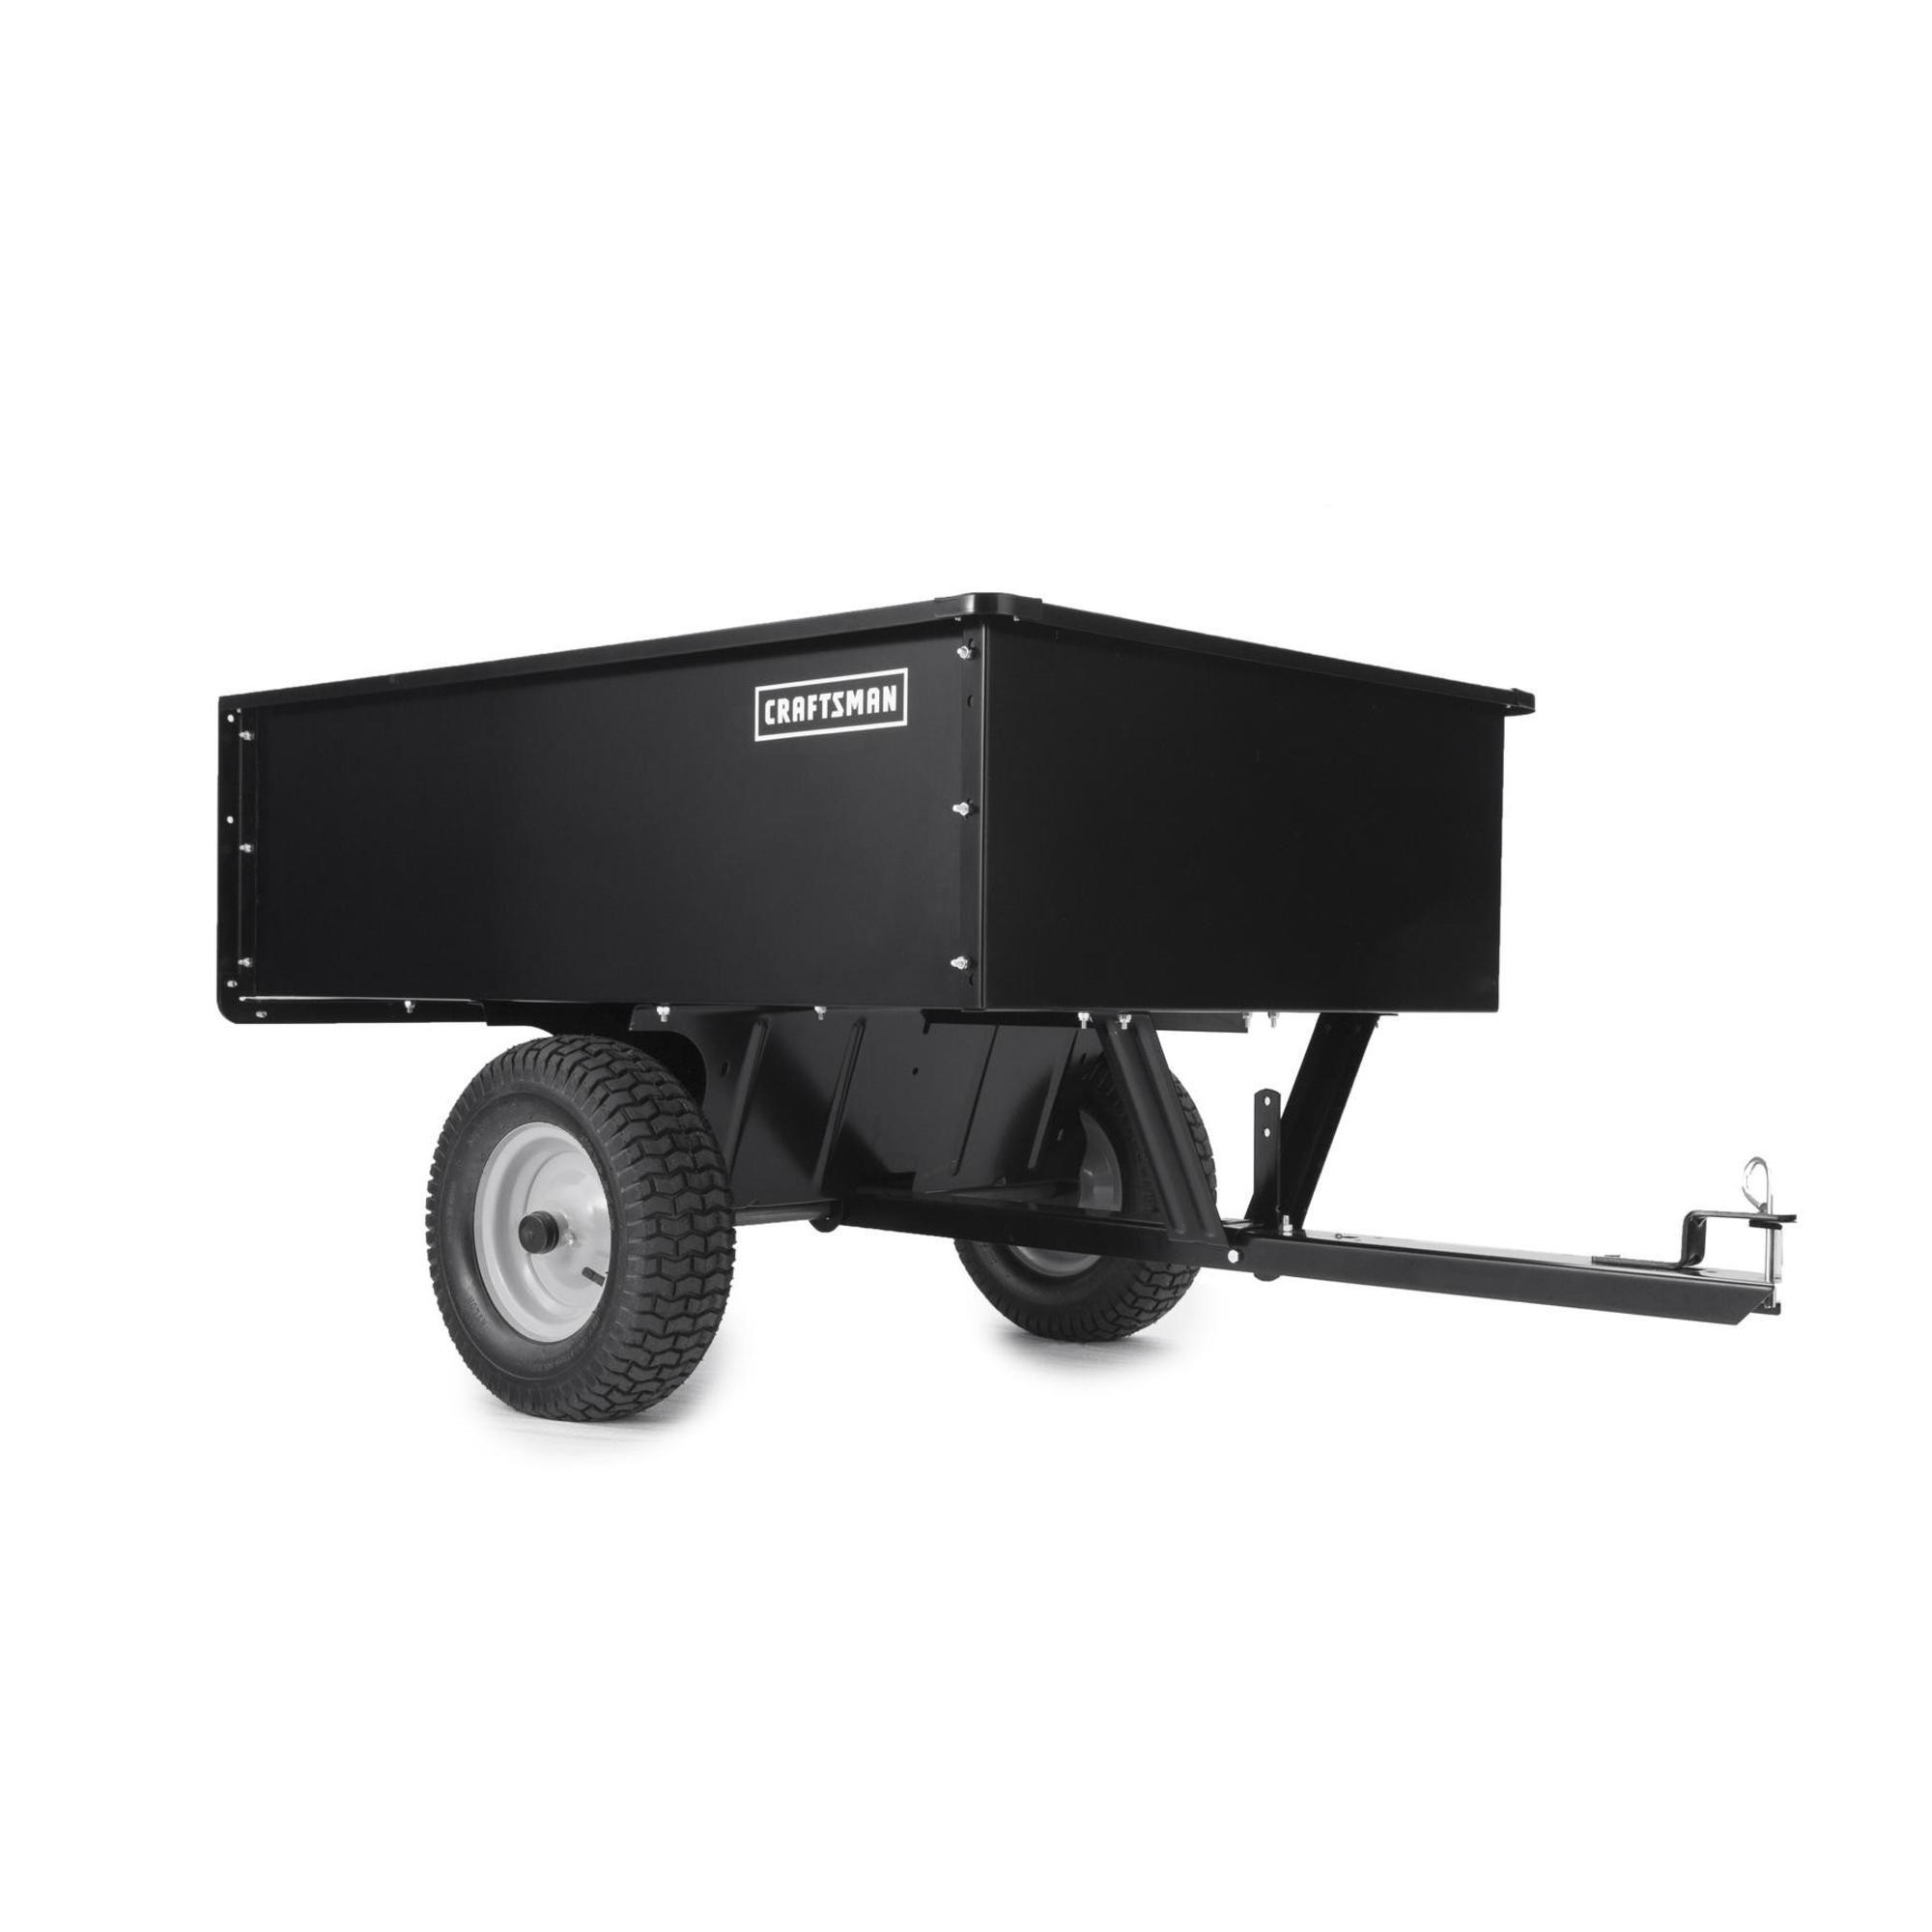 Craftsman 17 cu. ft. Steel Dump Cart